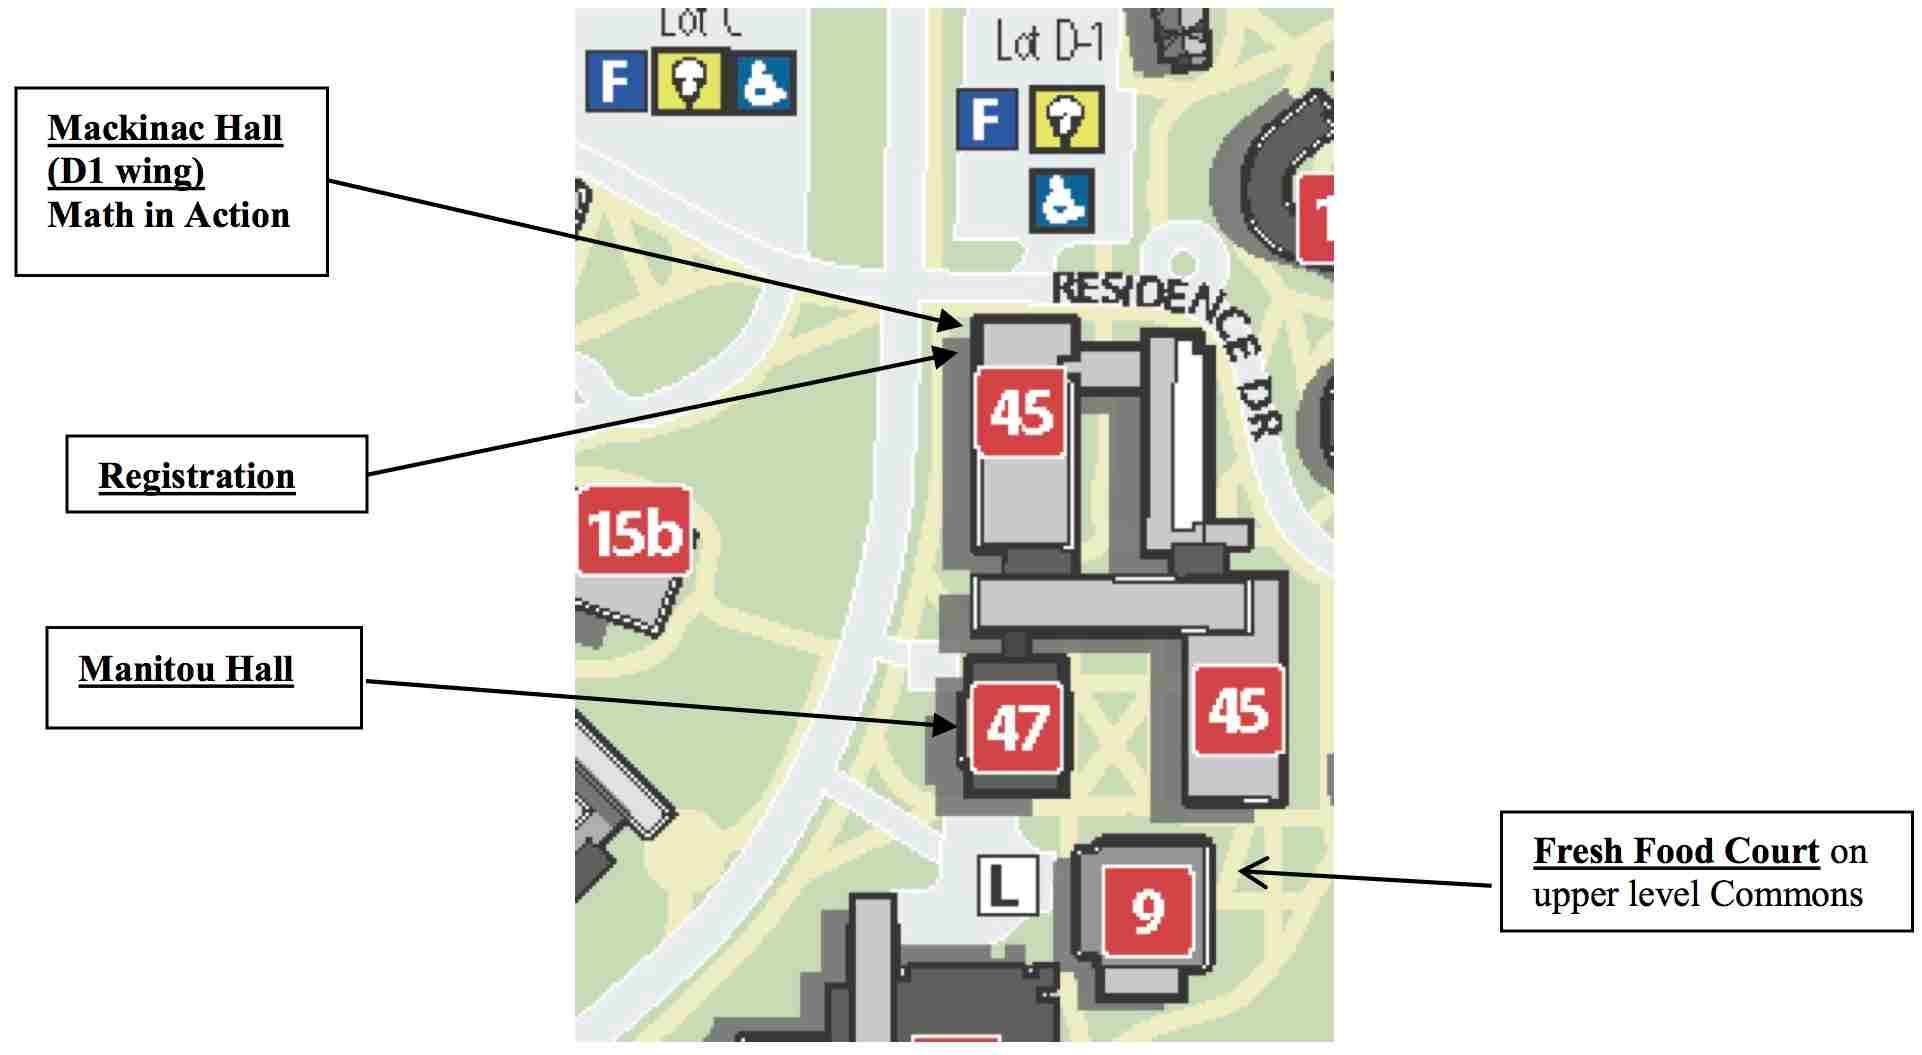 Gvsu Campus Map 2016.Gvsu Campus Map Cyrodiil Map